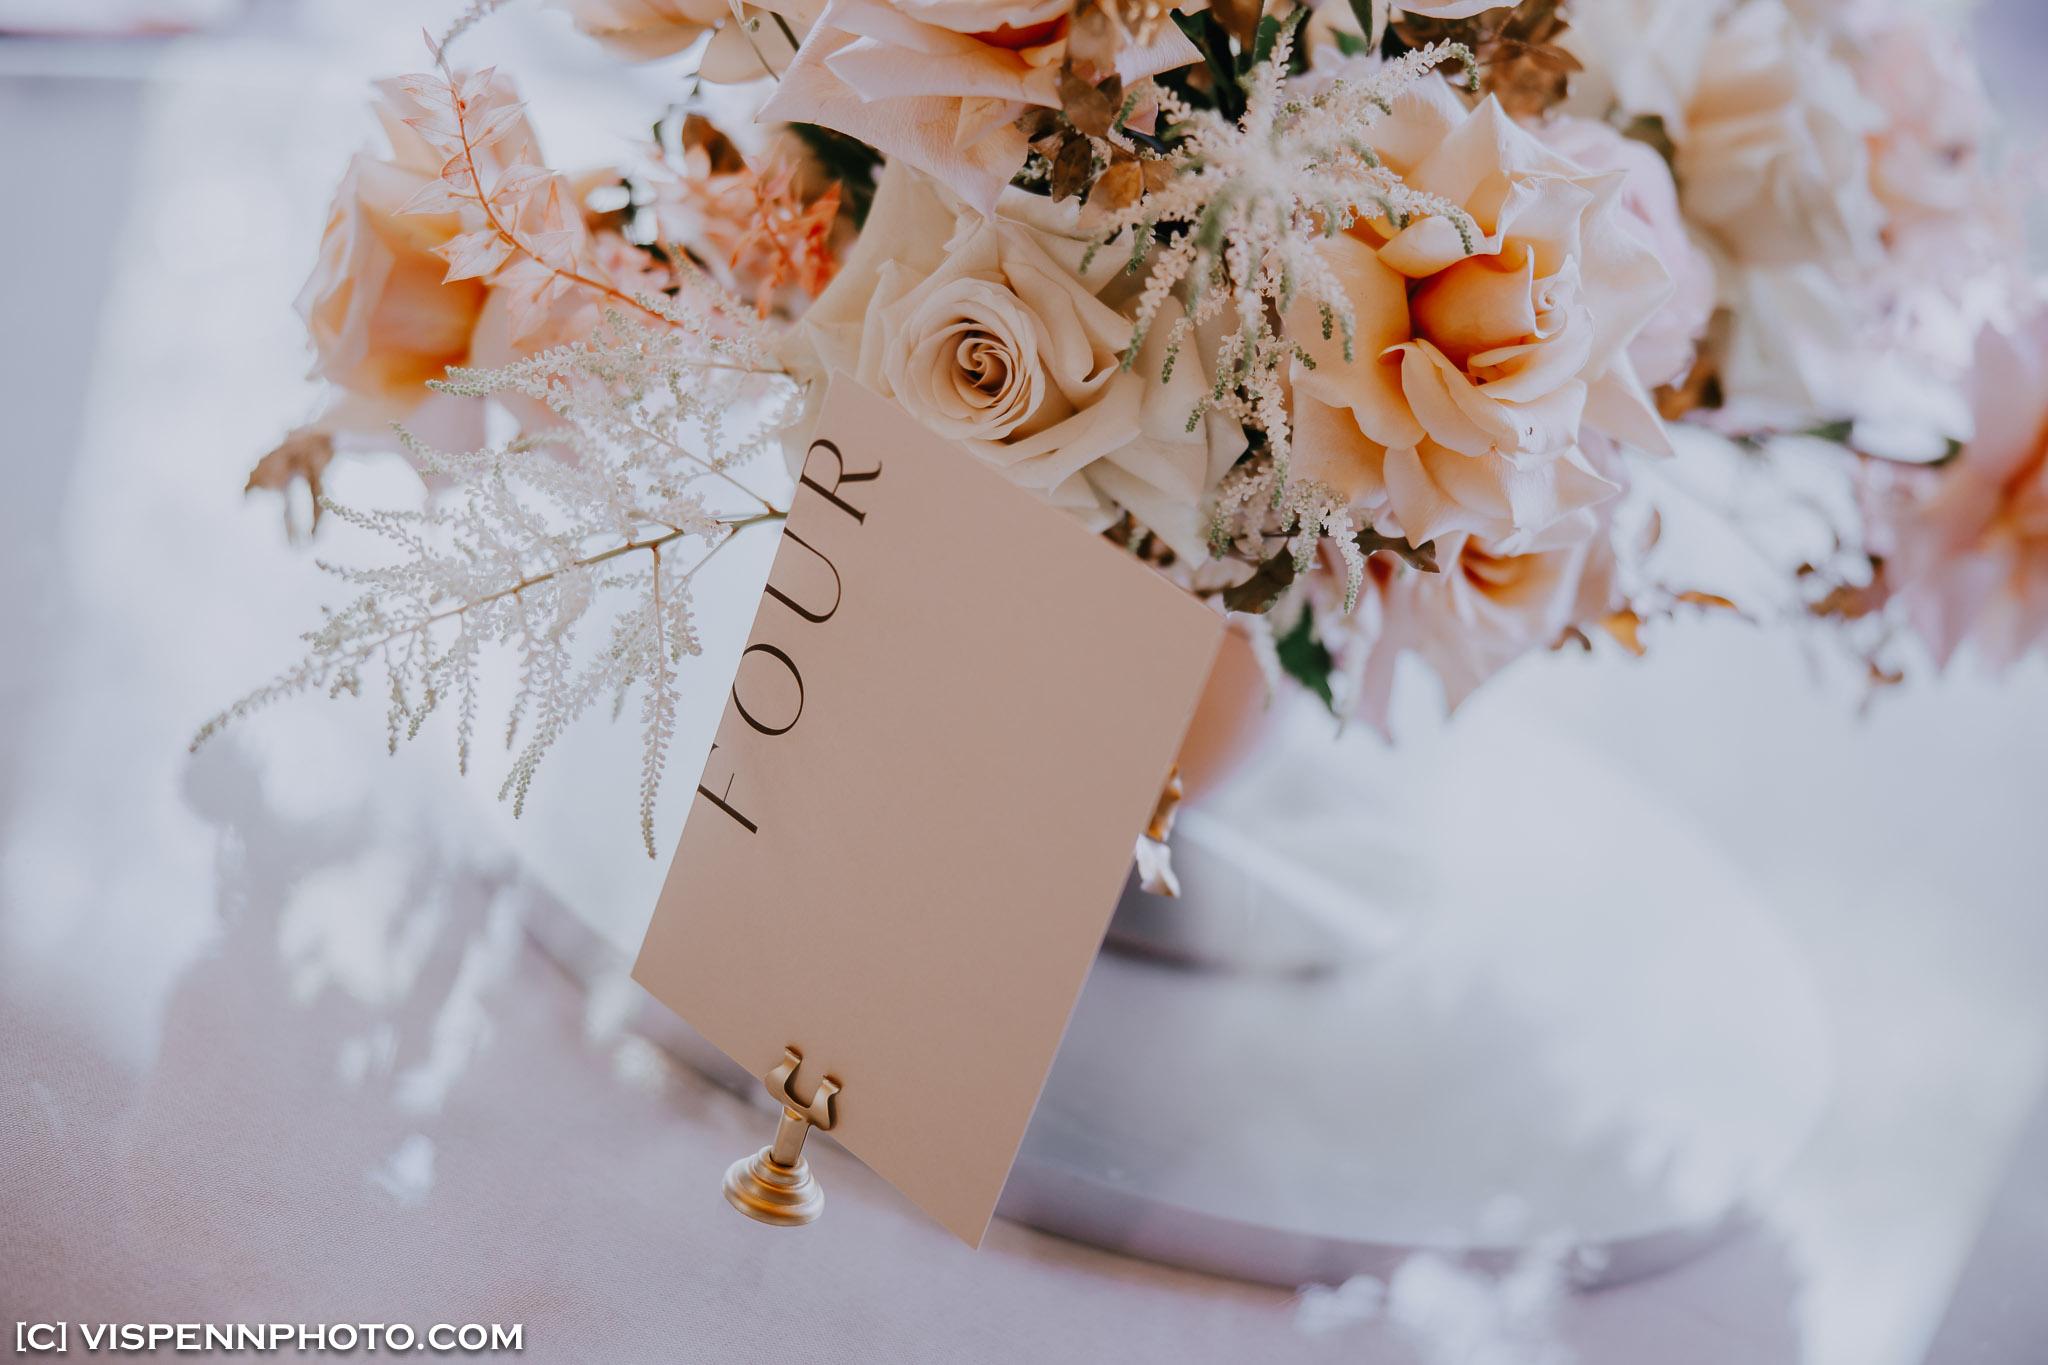 WEDDING DAY Photography Melbourne VISPENN 墨尔本 婚礼跟拍 婚礼摄像 婚礼摄影 结婚照 登记照 ElitaPB 07111 1P EOSR VISPENN